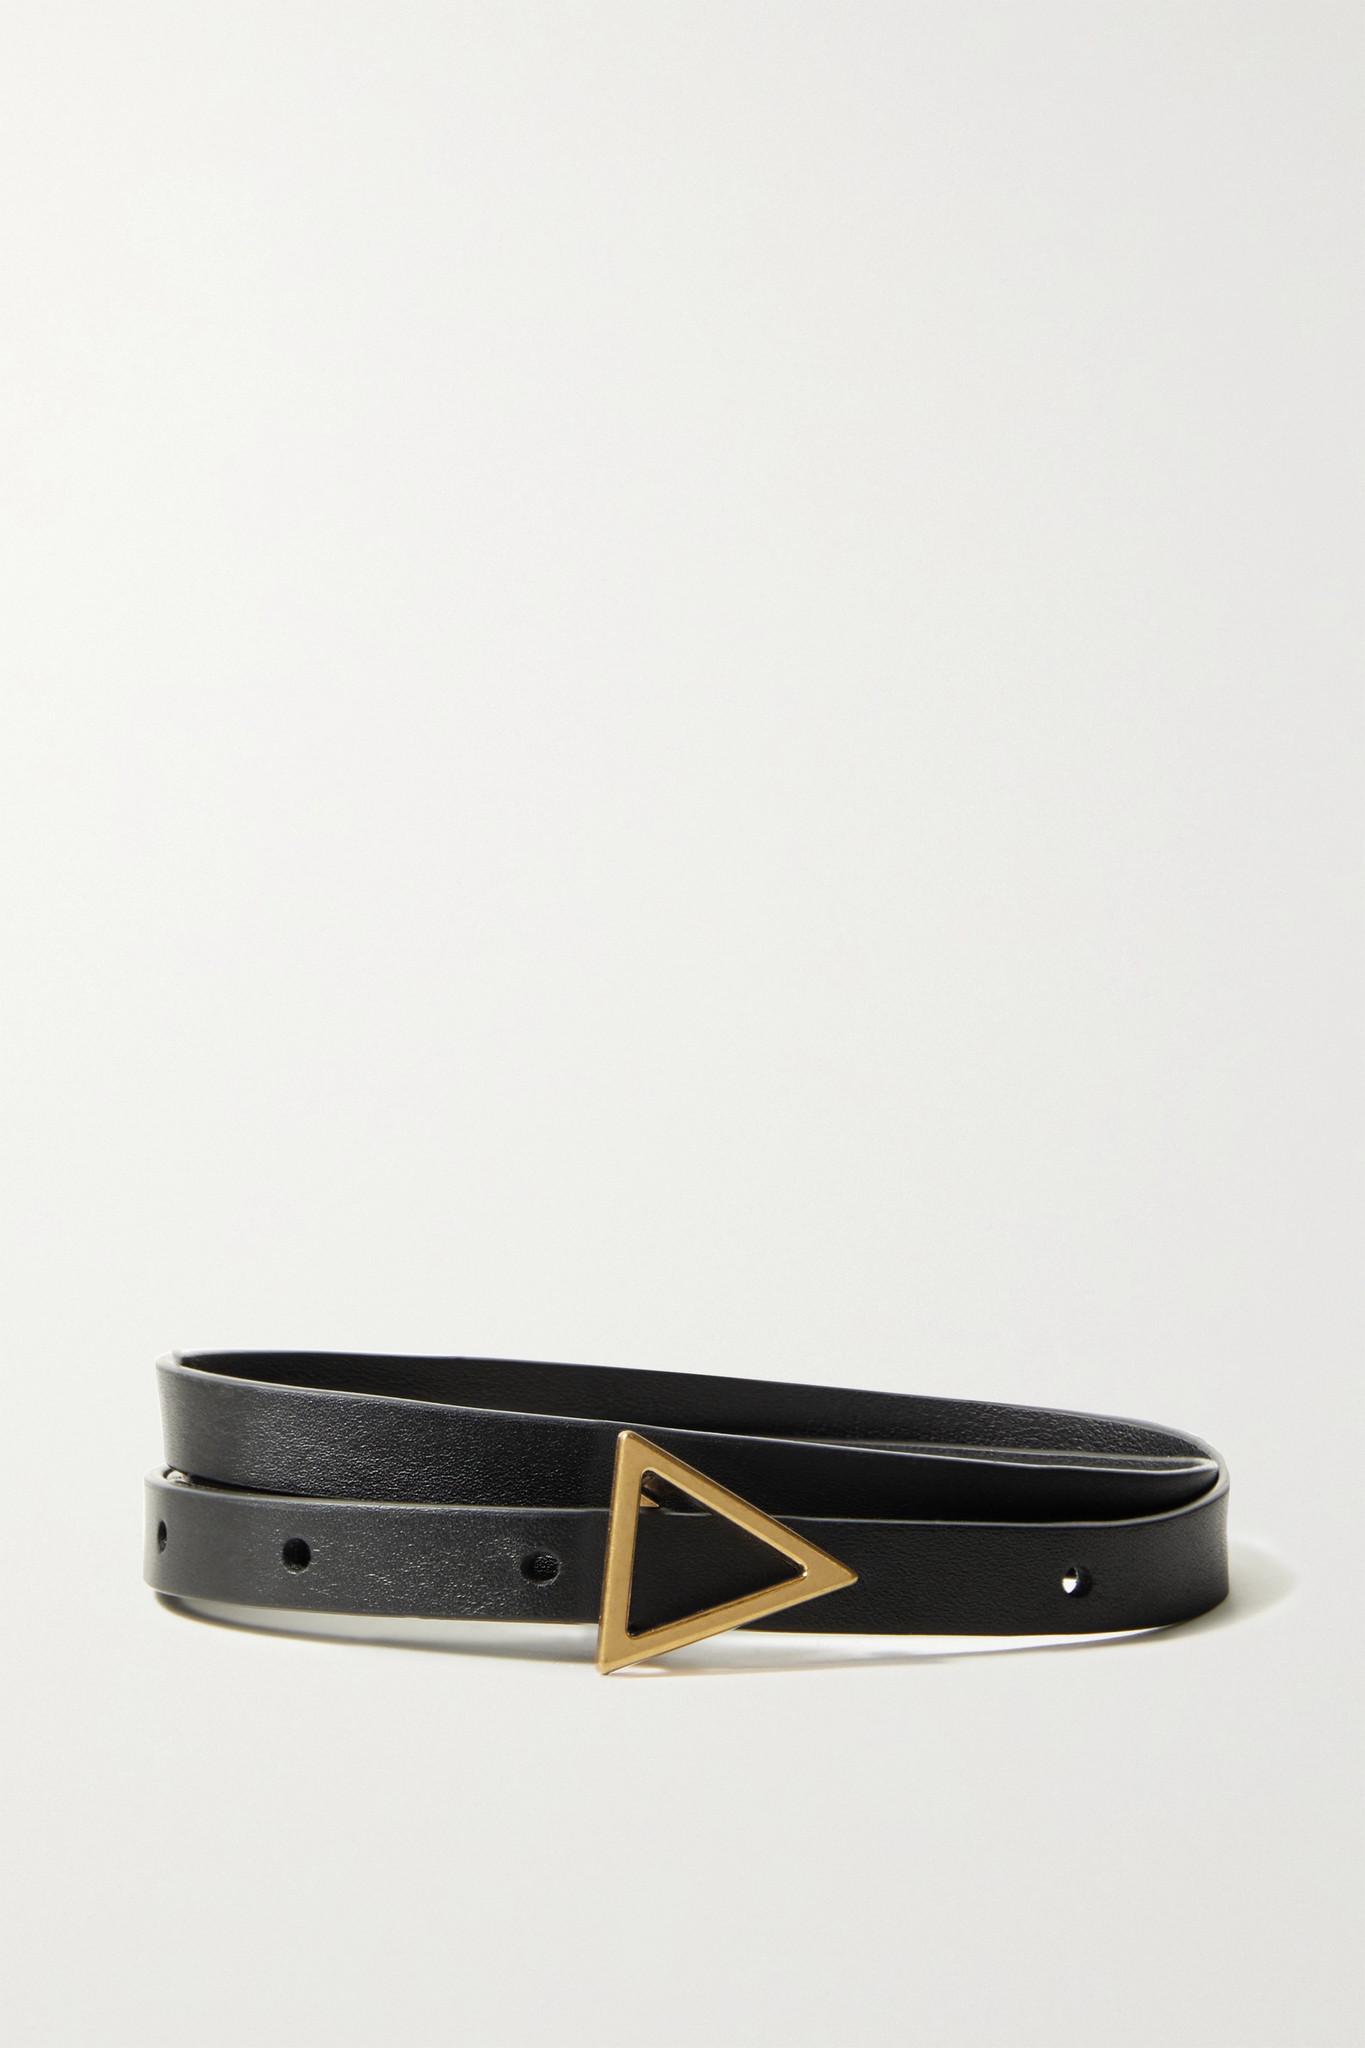 BOTTEGA VENETA - 皮革腰带 - 黑色 - 75